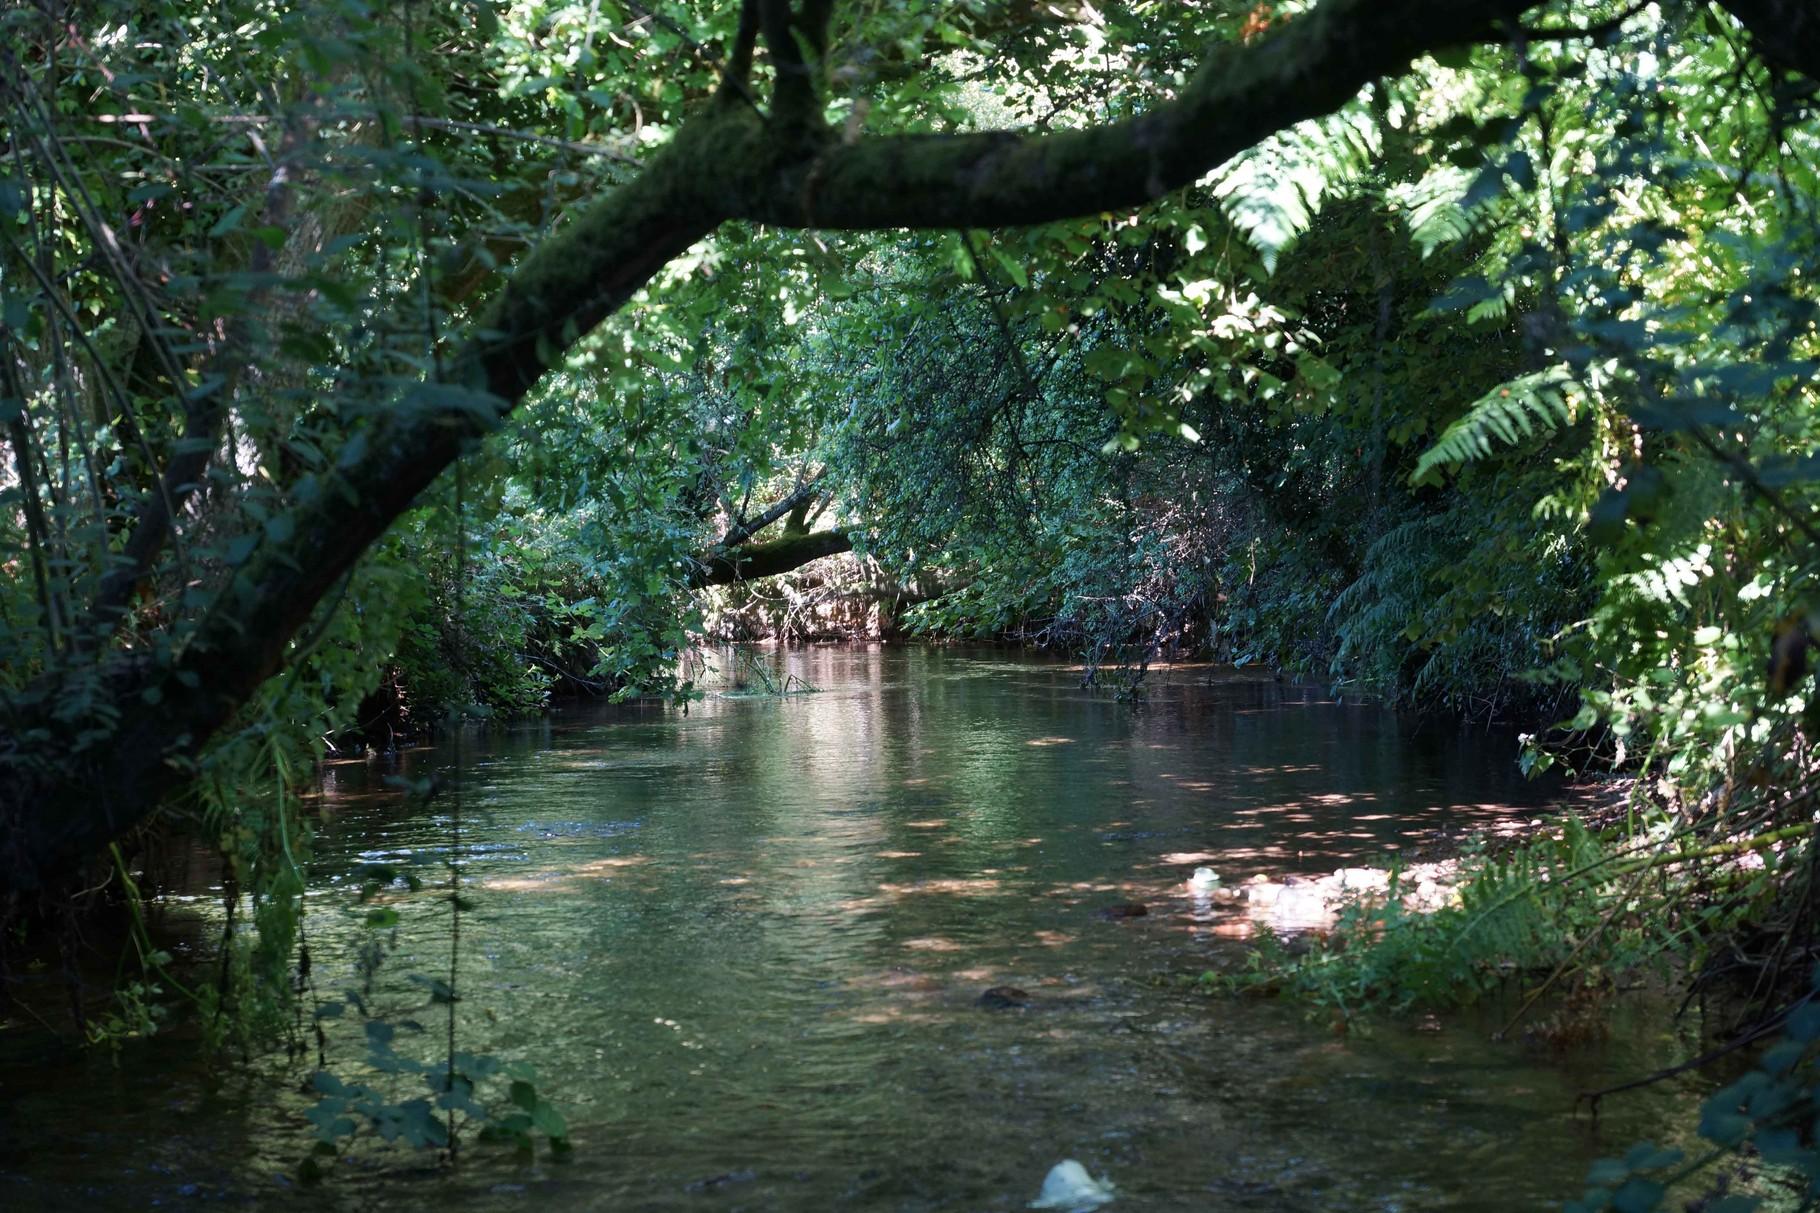 Vallée du Douron, Plouégat Moysan 19 (Pont Ar Forest)